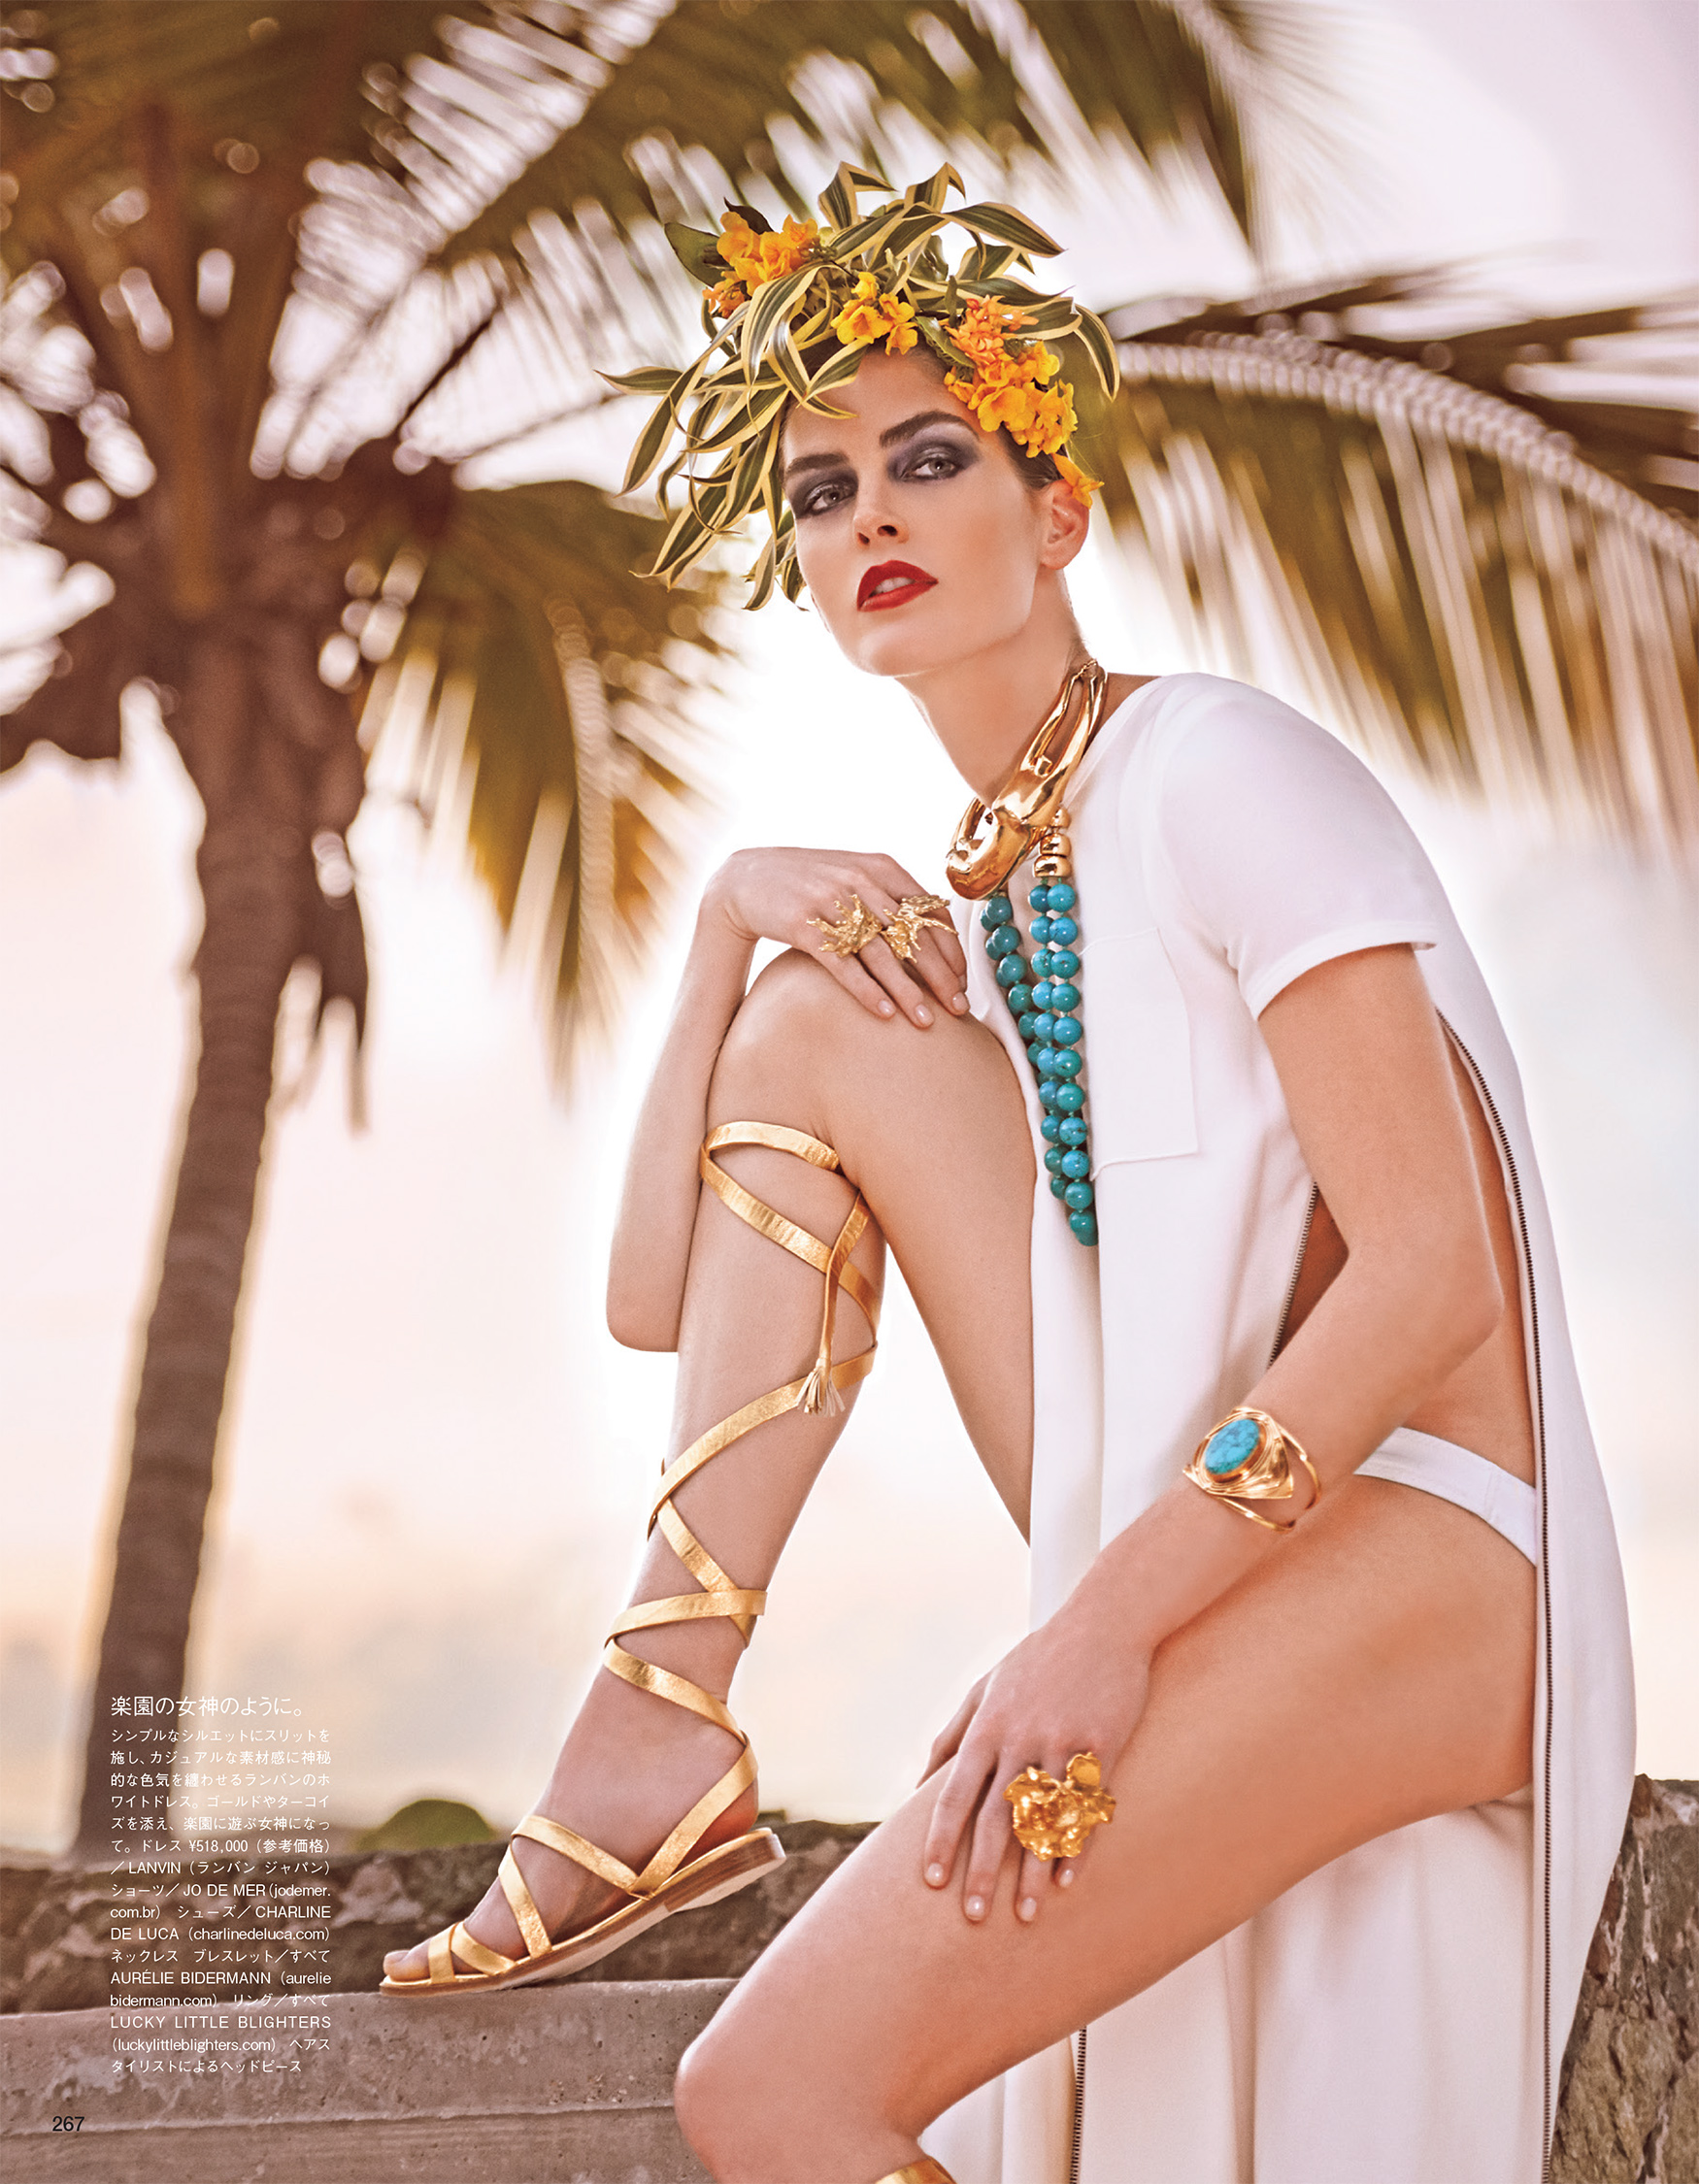 Giovanna-Battaglia-Vogue-Japan-Mariano-Vivanco-Forbidden-Paradise-9.jpg